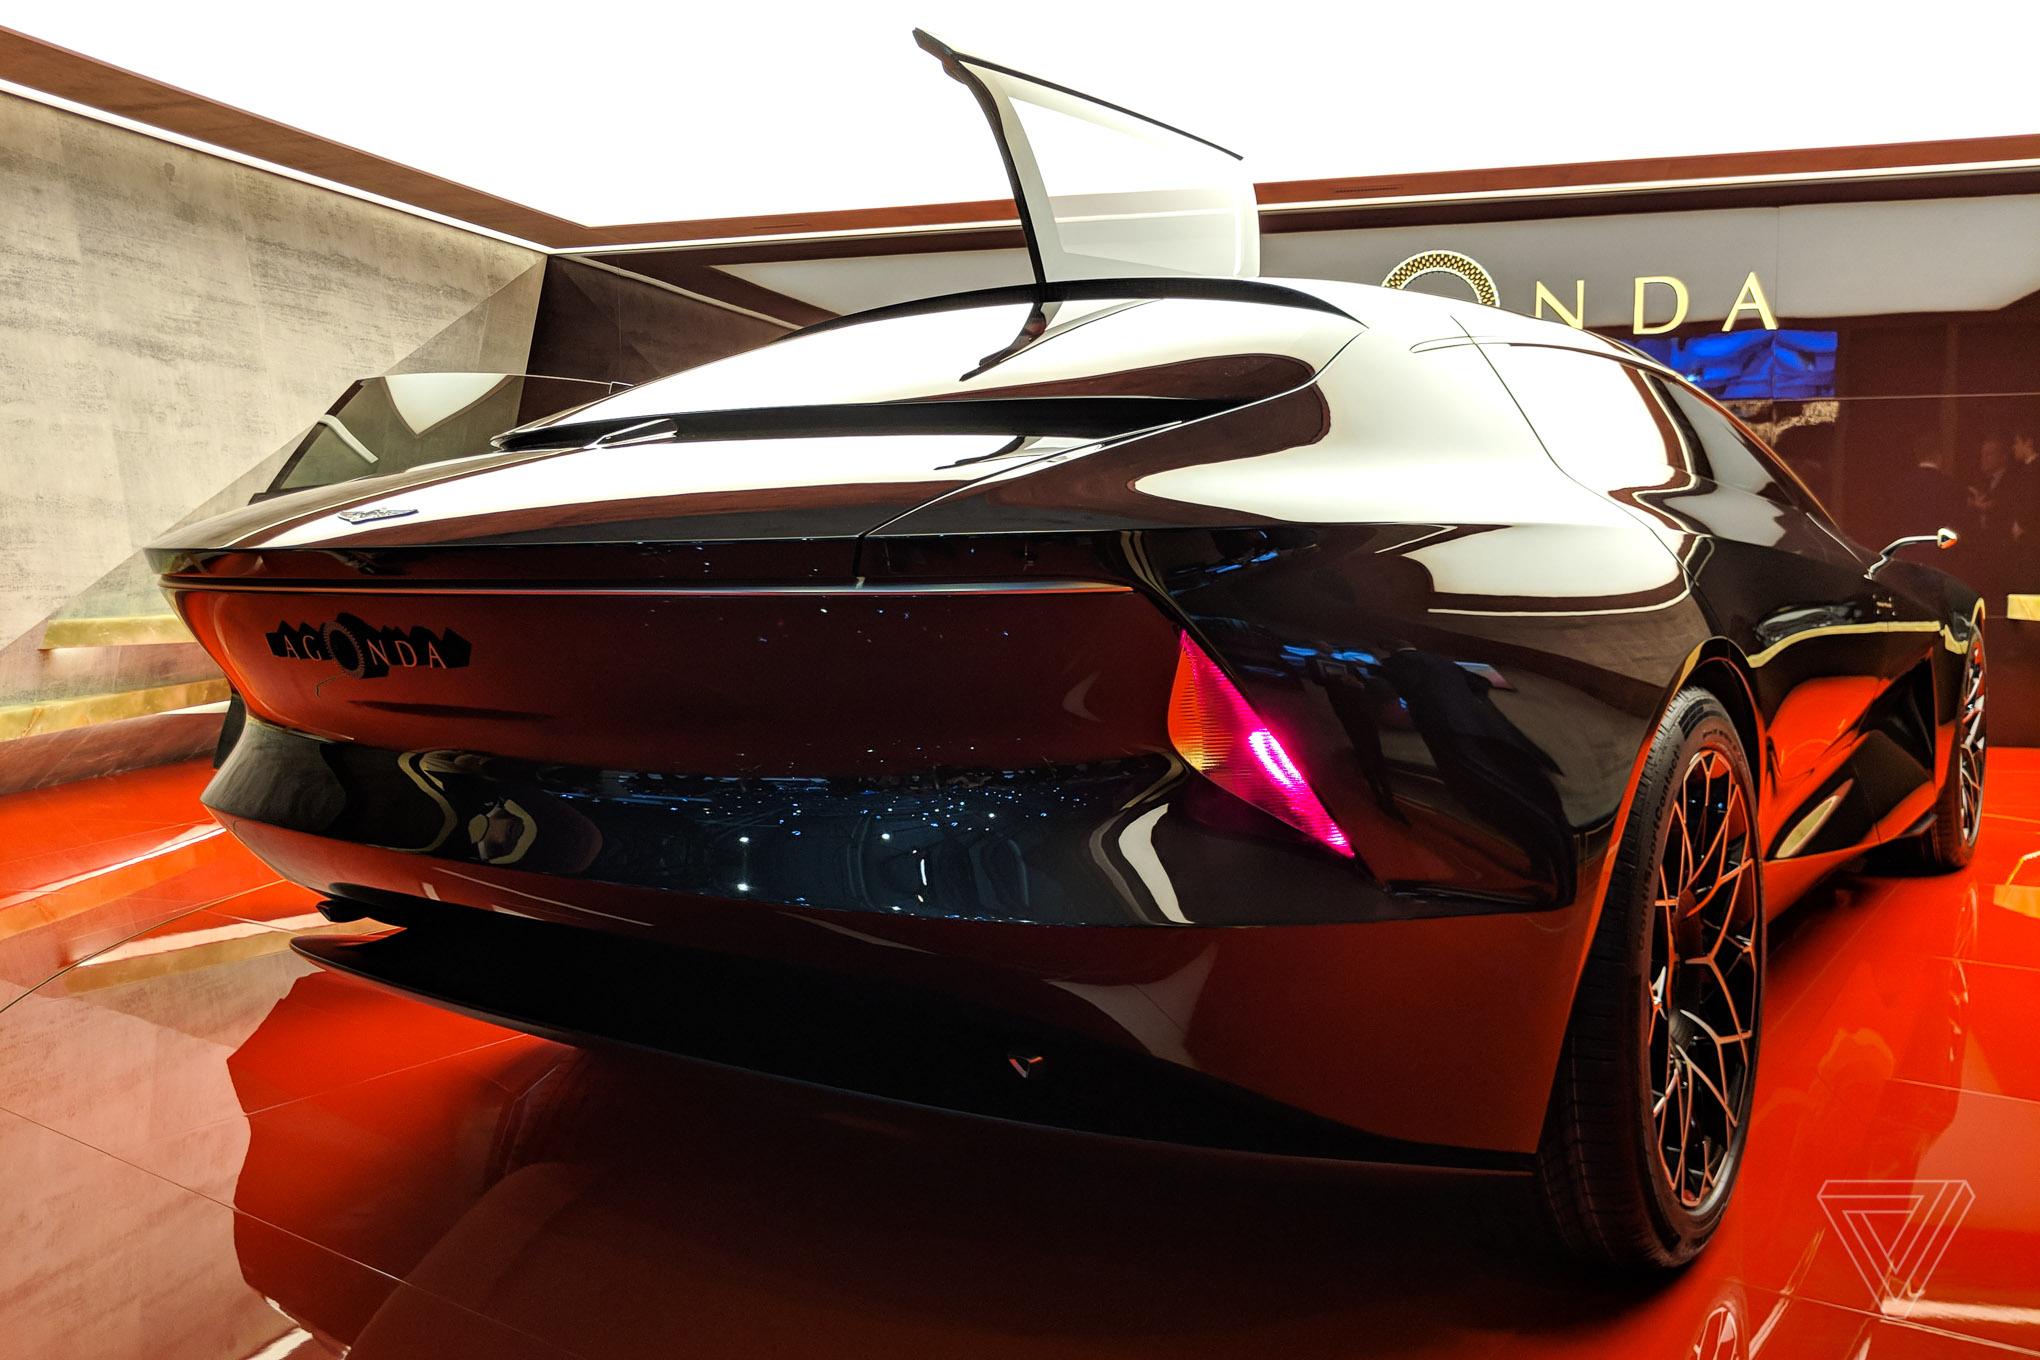 Aston Martins Lagonda Concept Car Is Breathtaking The Verge - Aston martin lagonda